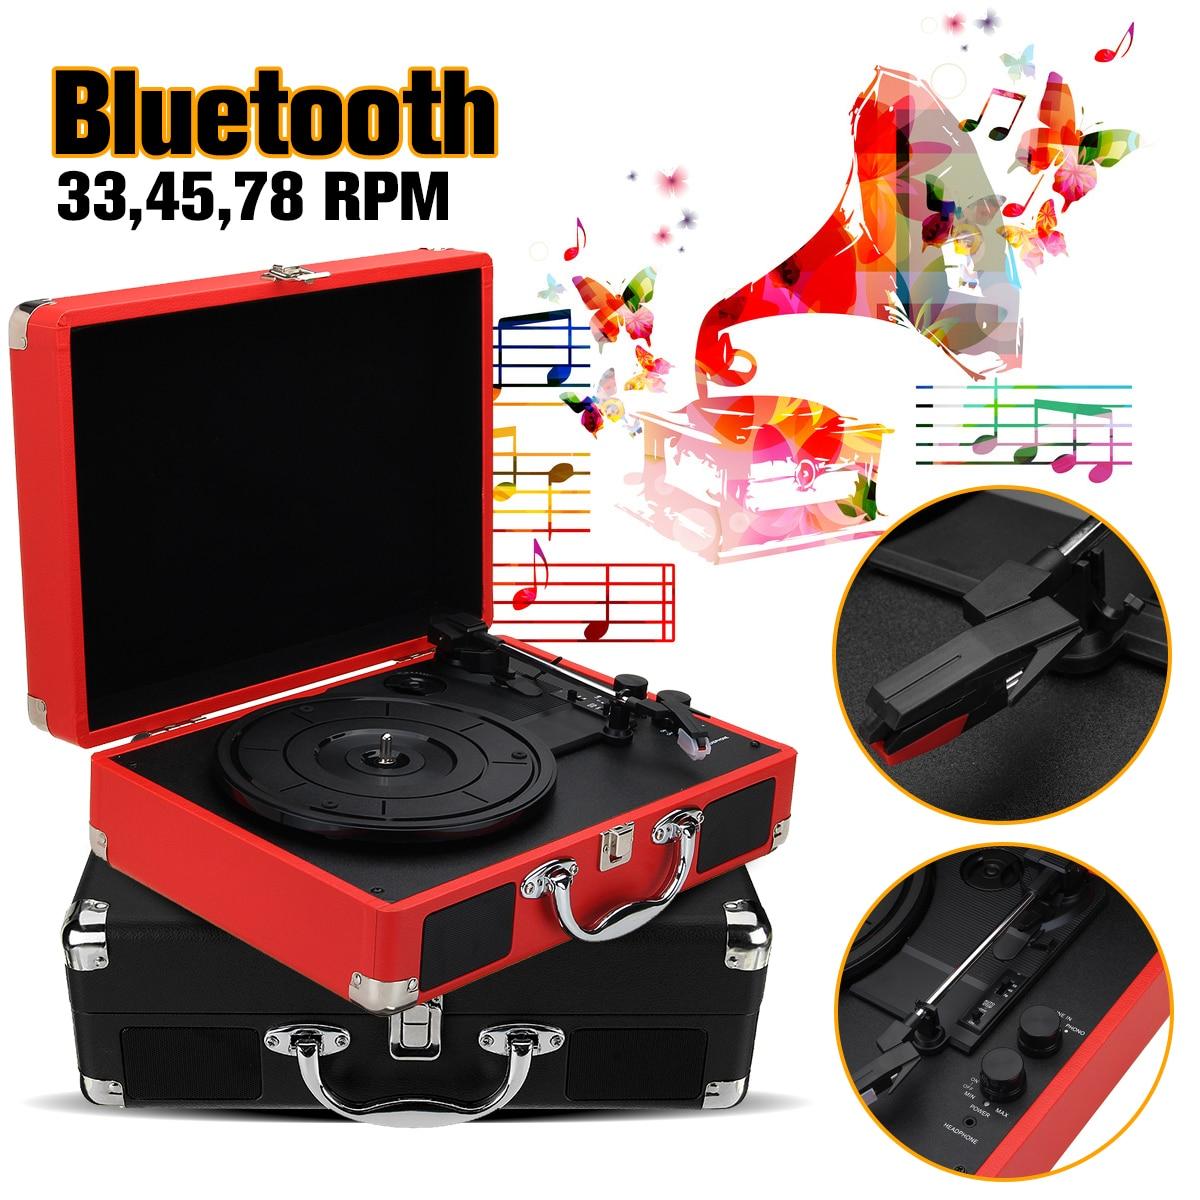 Plastic Wood Retro 33/45/78 RPM Bluetooth PH/ INT/ BT 2.0 Suitcase Turntable Vinyl LP Record Phone Player 3-Speed 3.5mm AUX IN цены